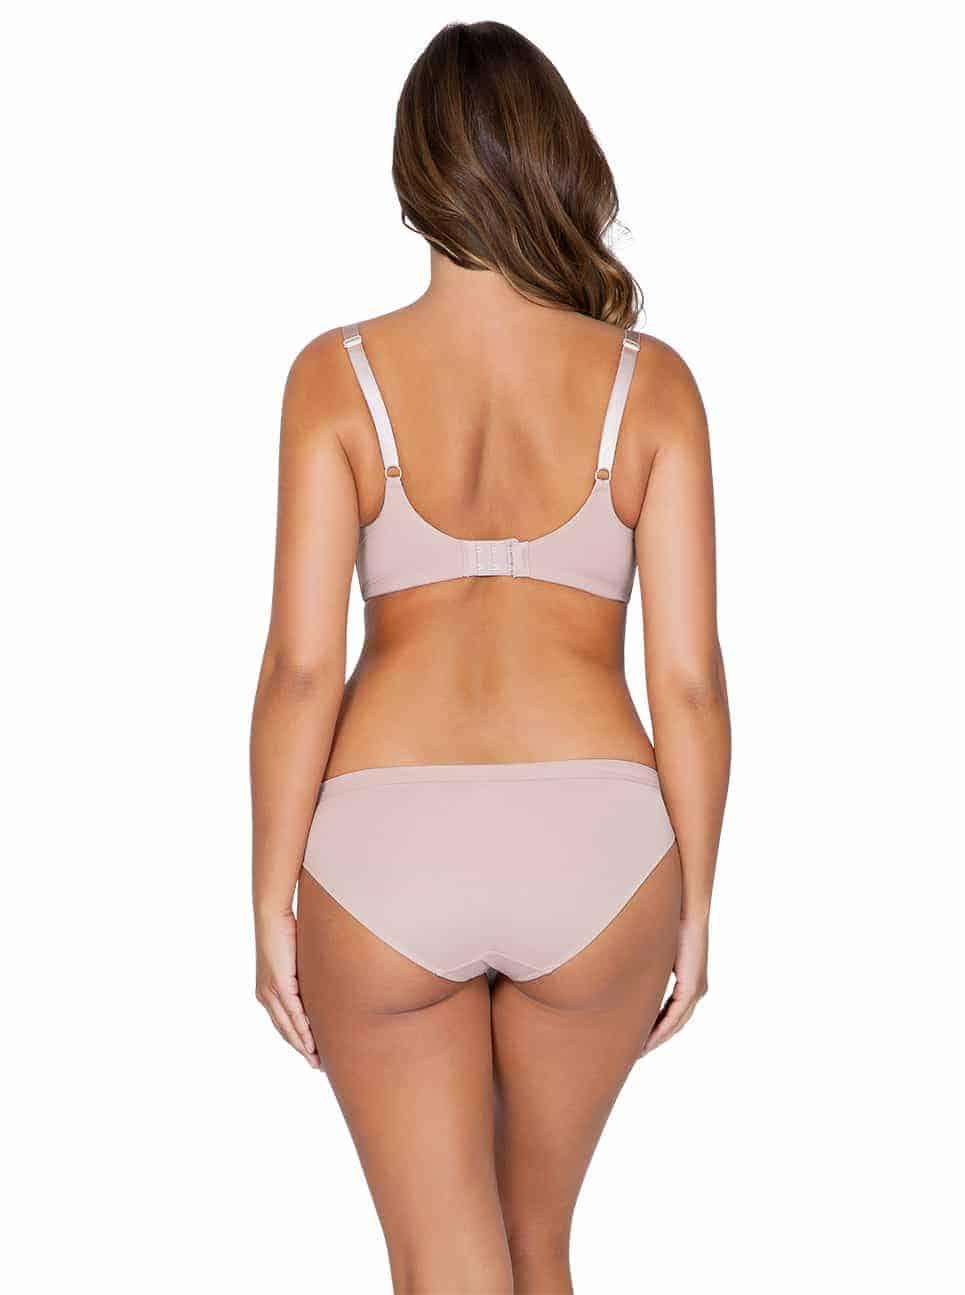 WendyP5411 PlungePadded P5413 BikiniNudeBack - Wendy Bikini – Victorian Rose – P5413